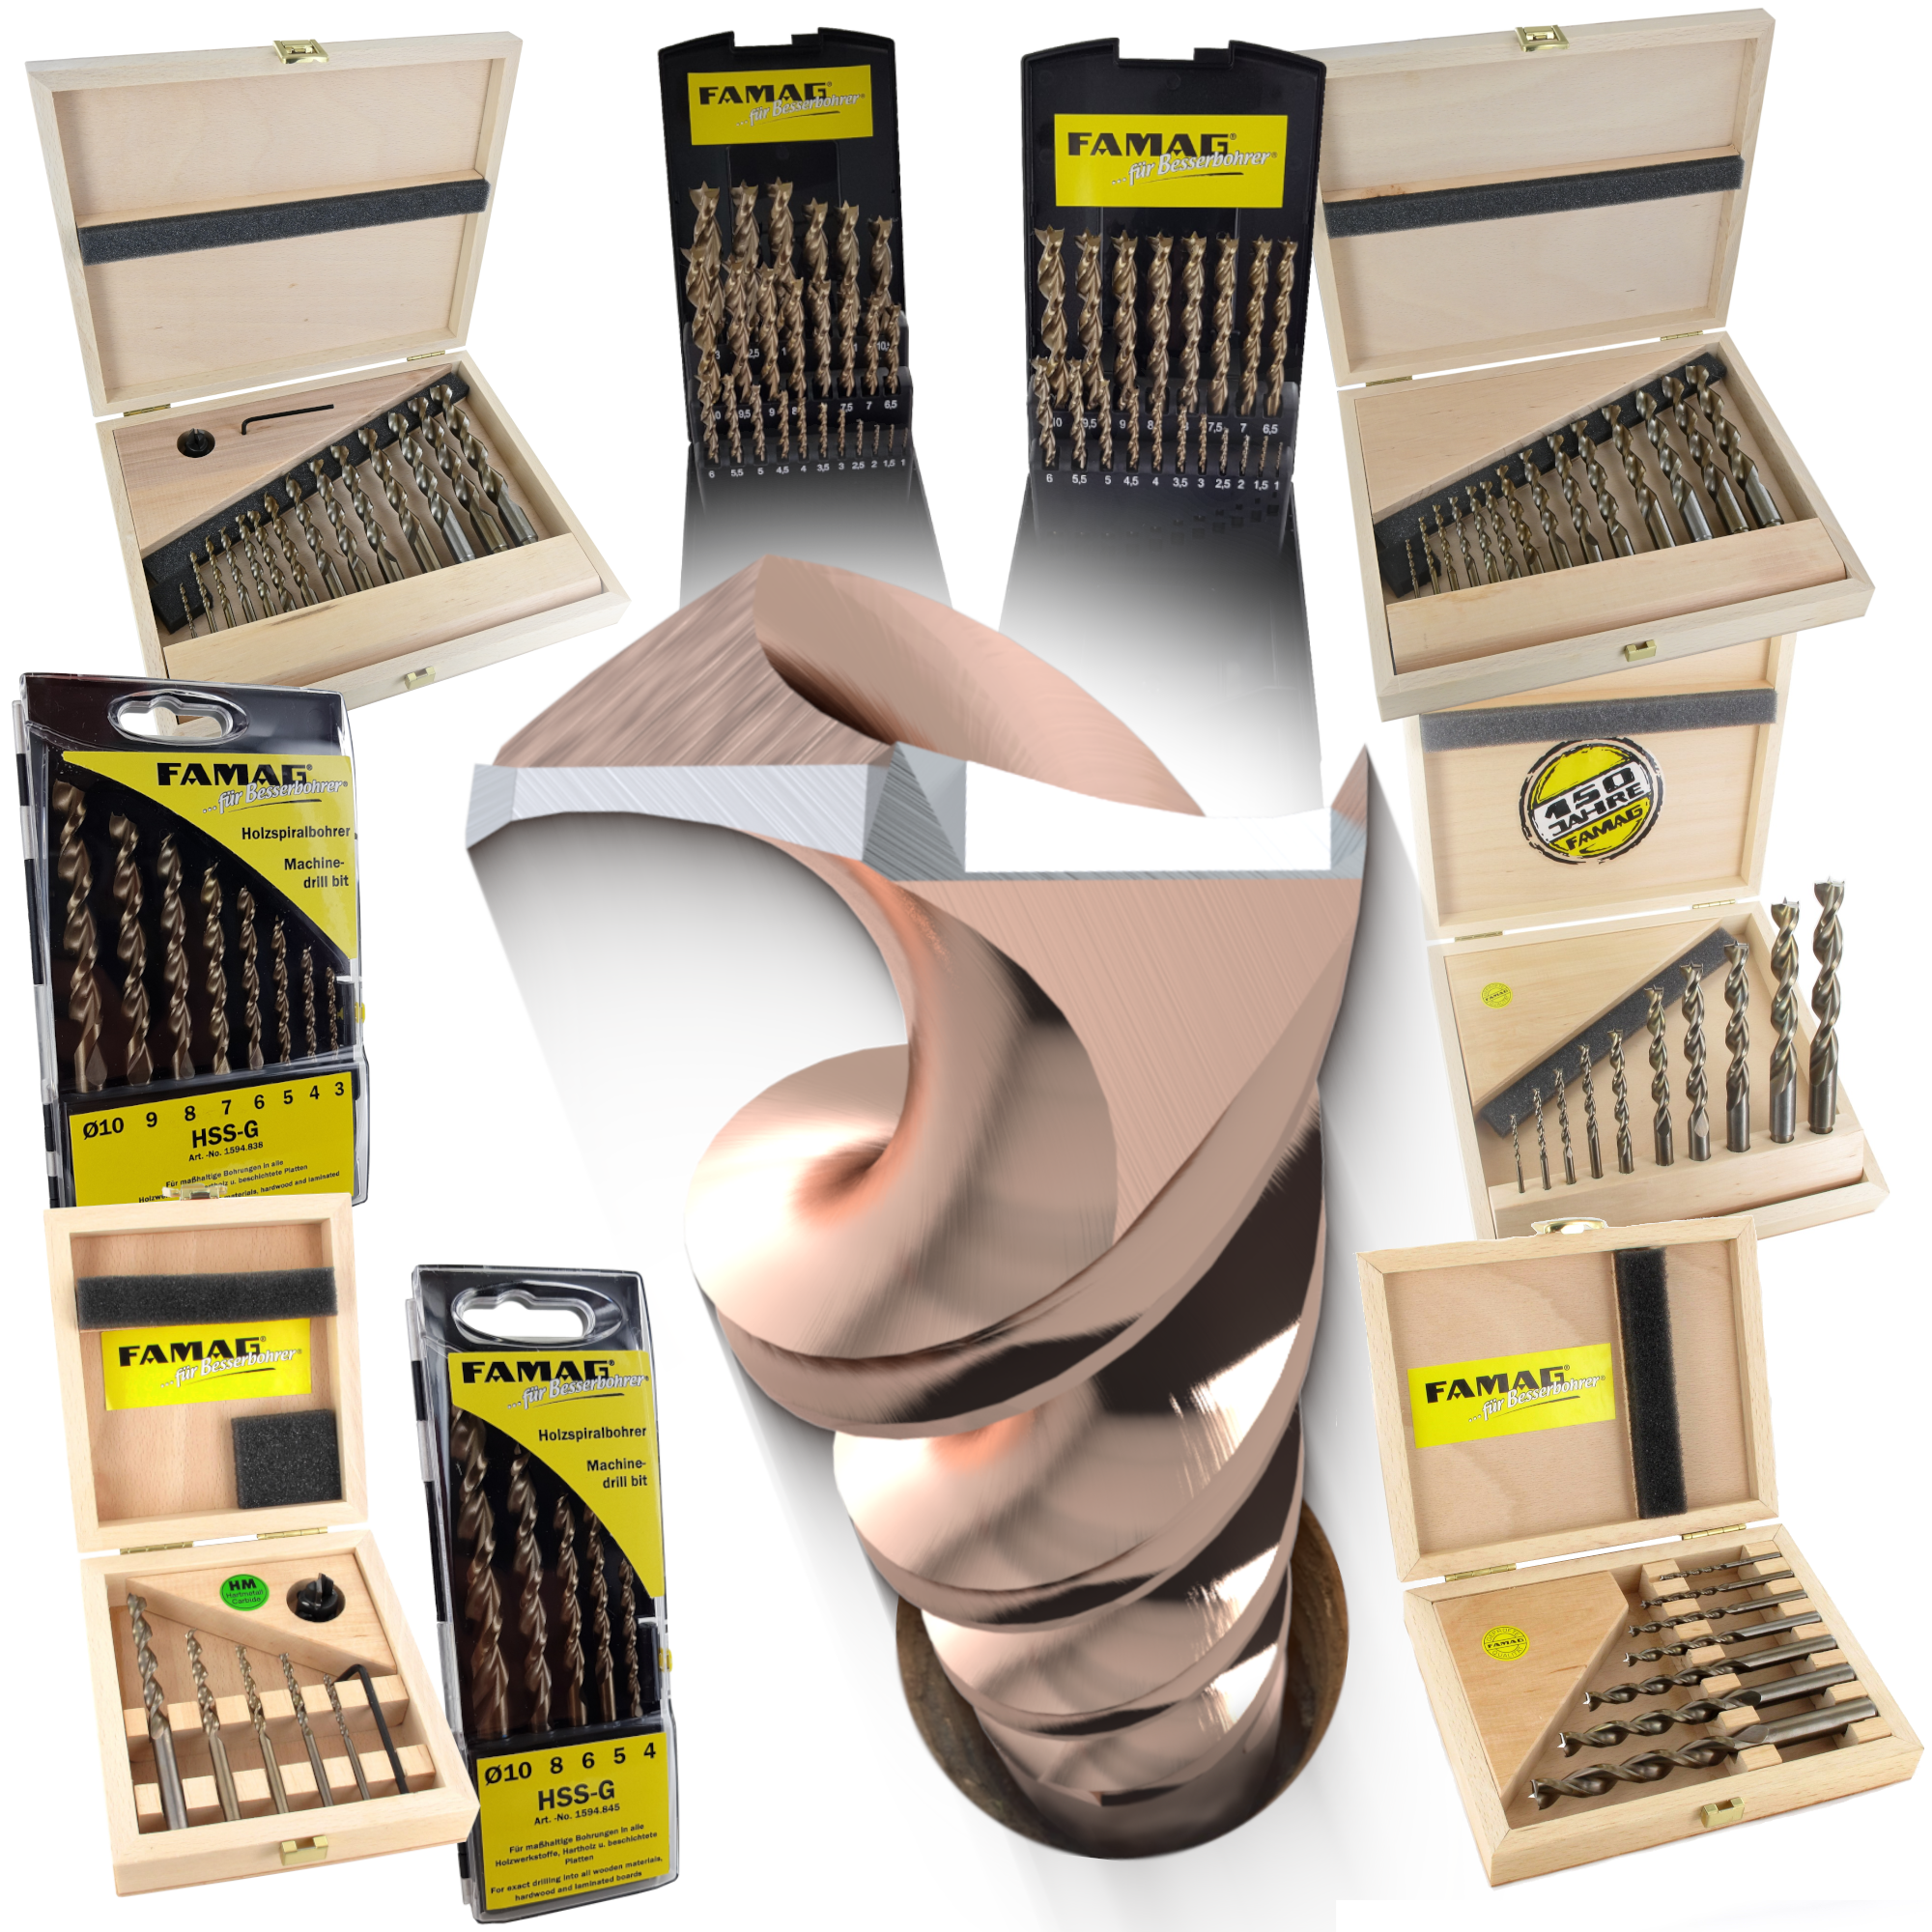 FAMAG Bormax Stake Drill WS 15 x 57 x 90 mm Shank 10 mm with Cutting Edge 1624.015.00 15x57x90mm S=10mm eine Schneide